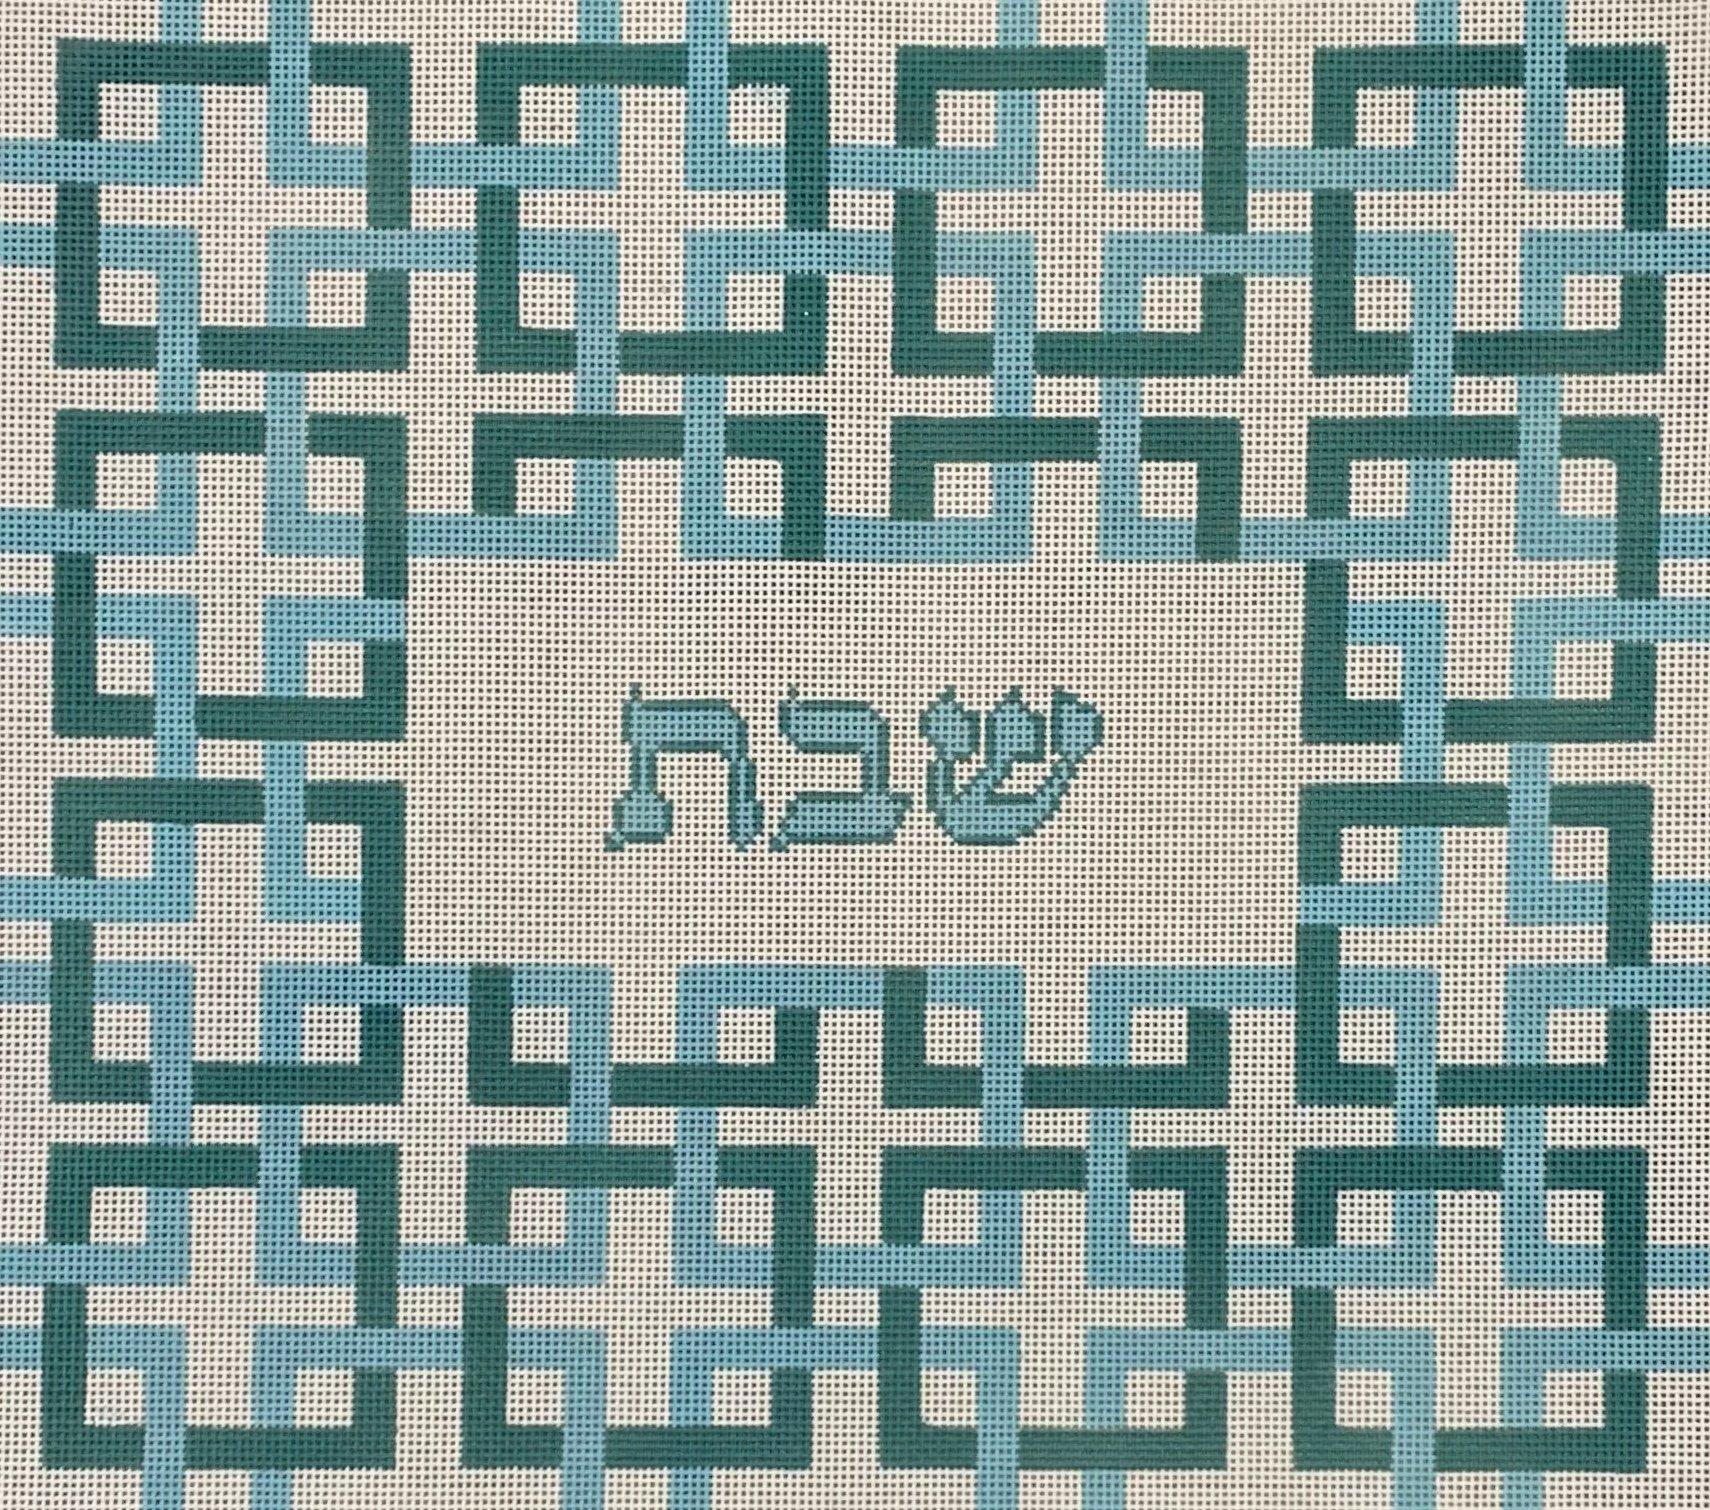 Challah Cover - Interlocking Squares w/ Shabbat